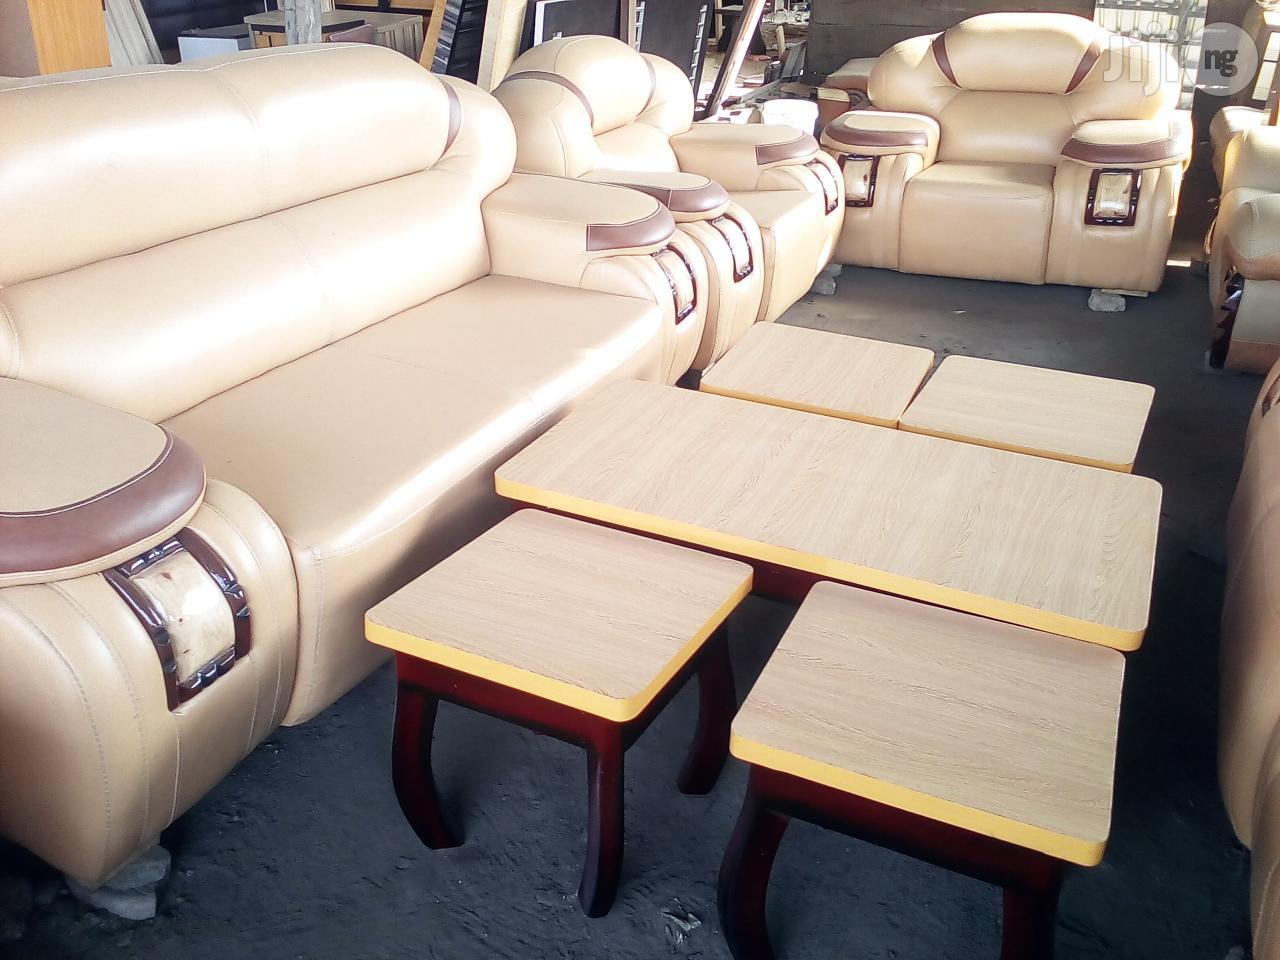 Original Italian Designed Cushion Chair | Furniture for sale in Ojo, Lagos State, Nigeria